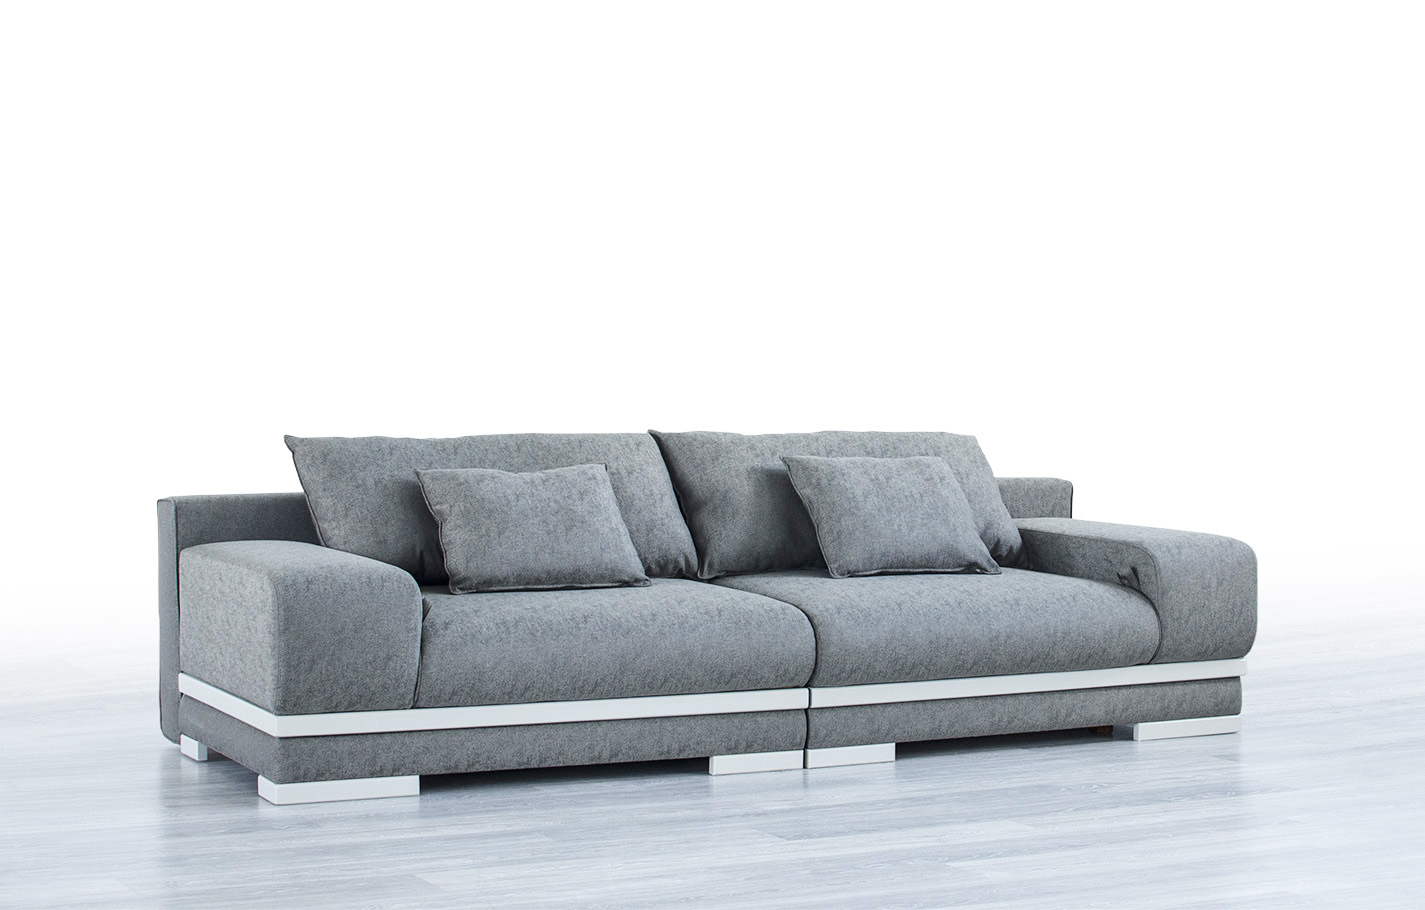 sofa_komfort-2_3